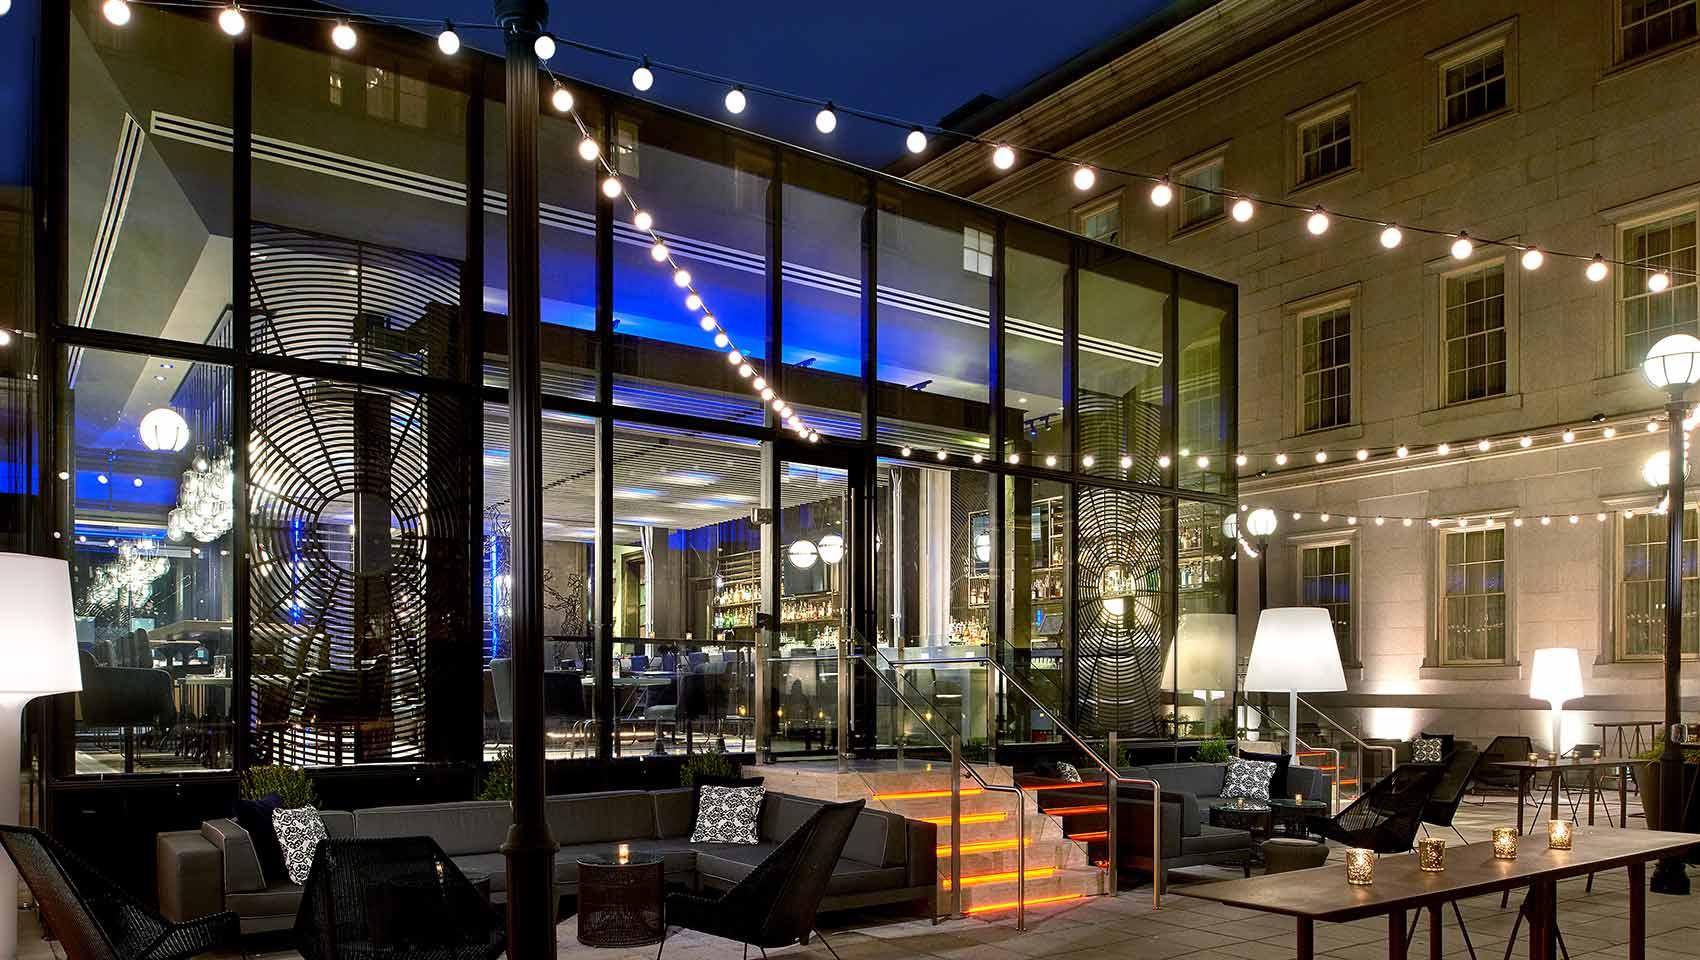 Kimpton Hotel Monaco Washington D C Appoints New